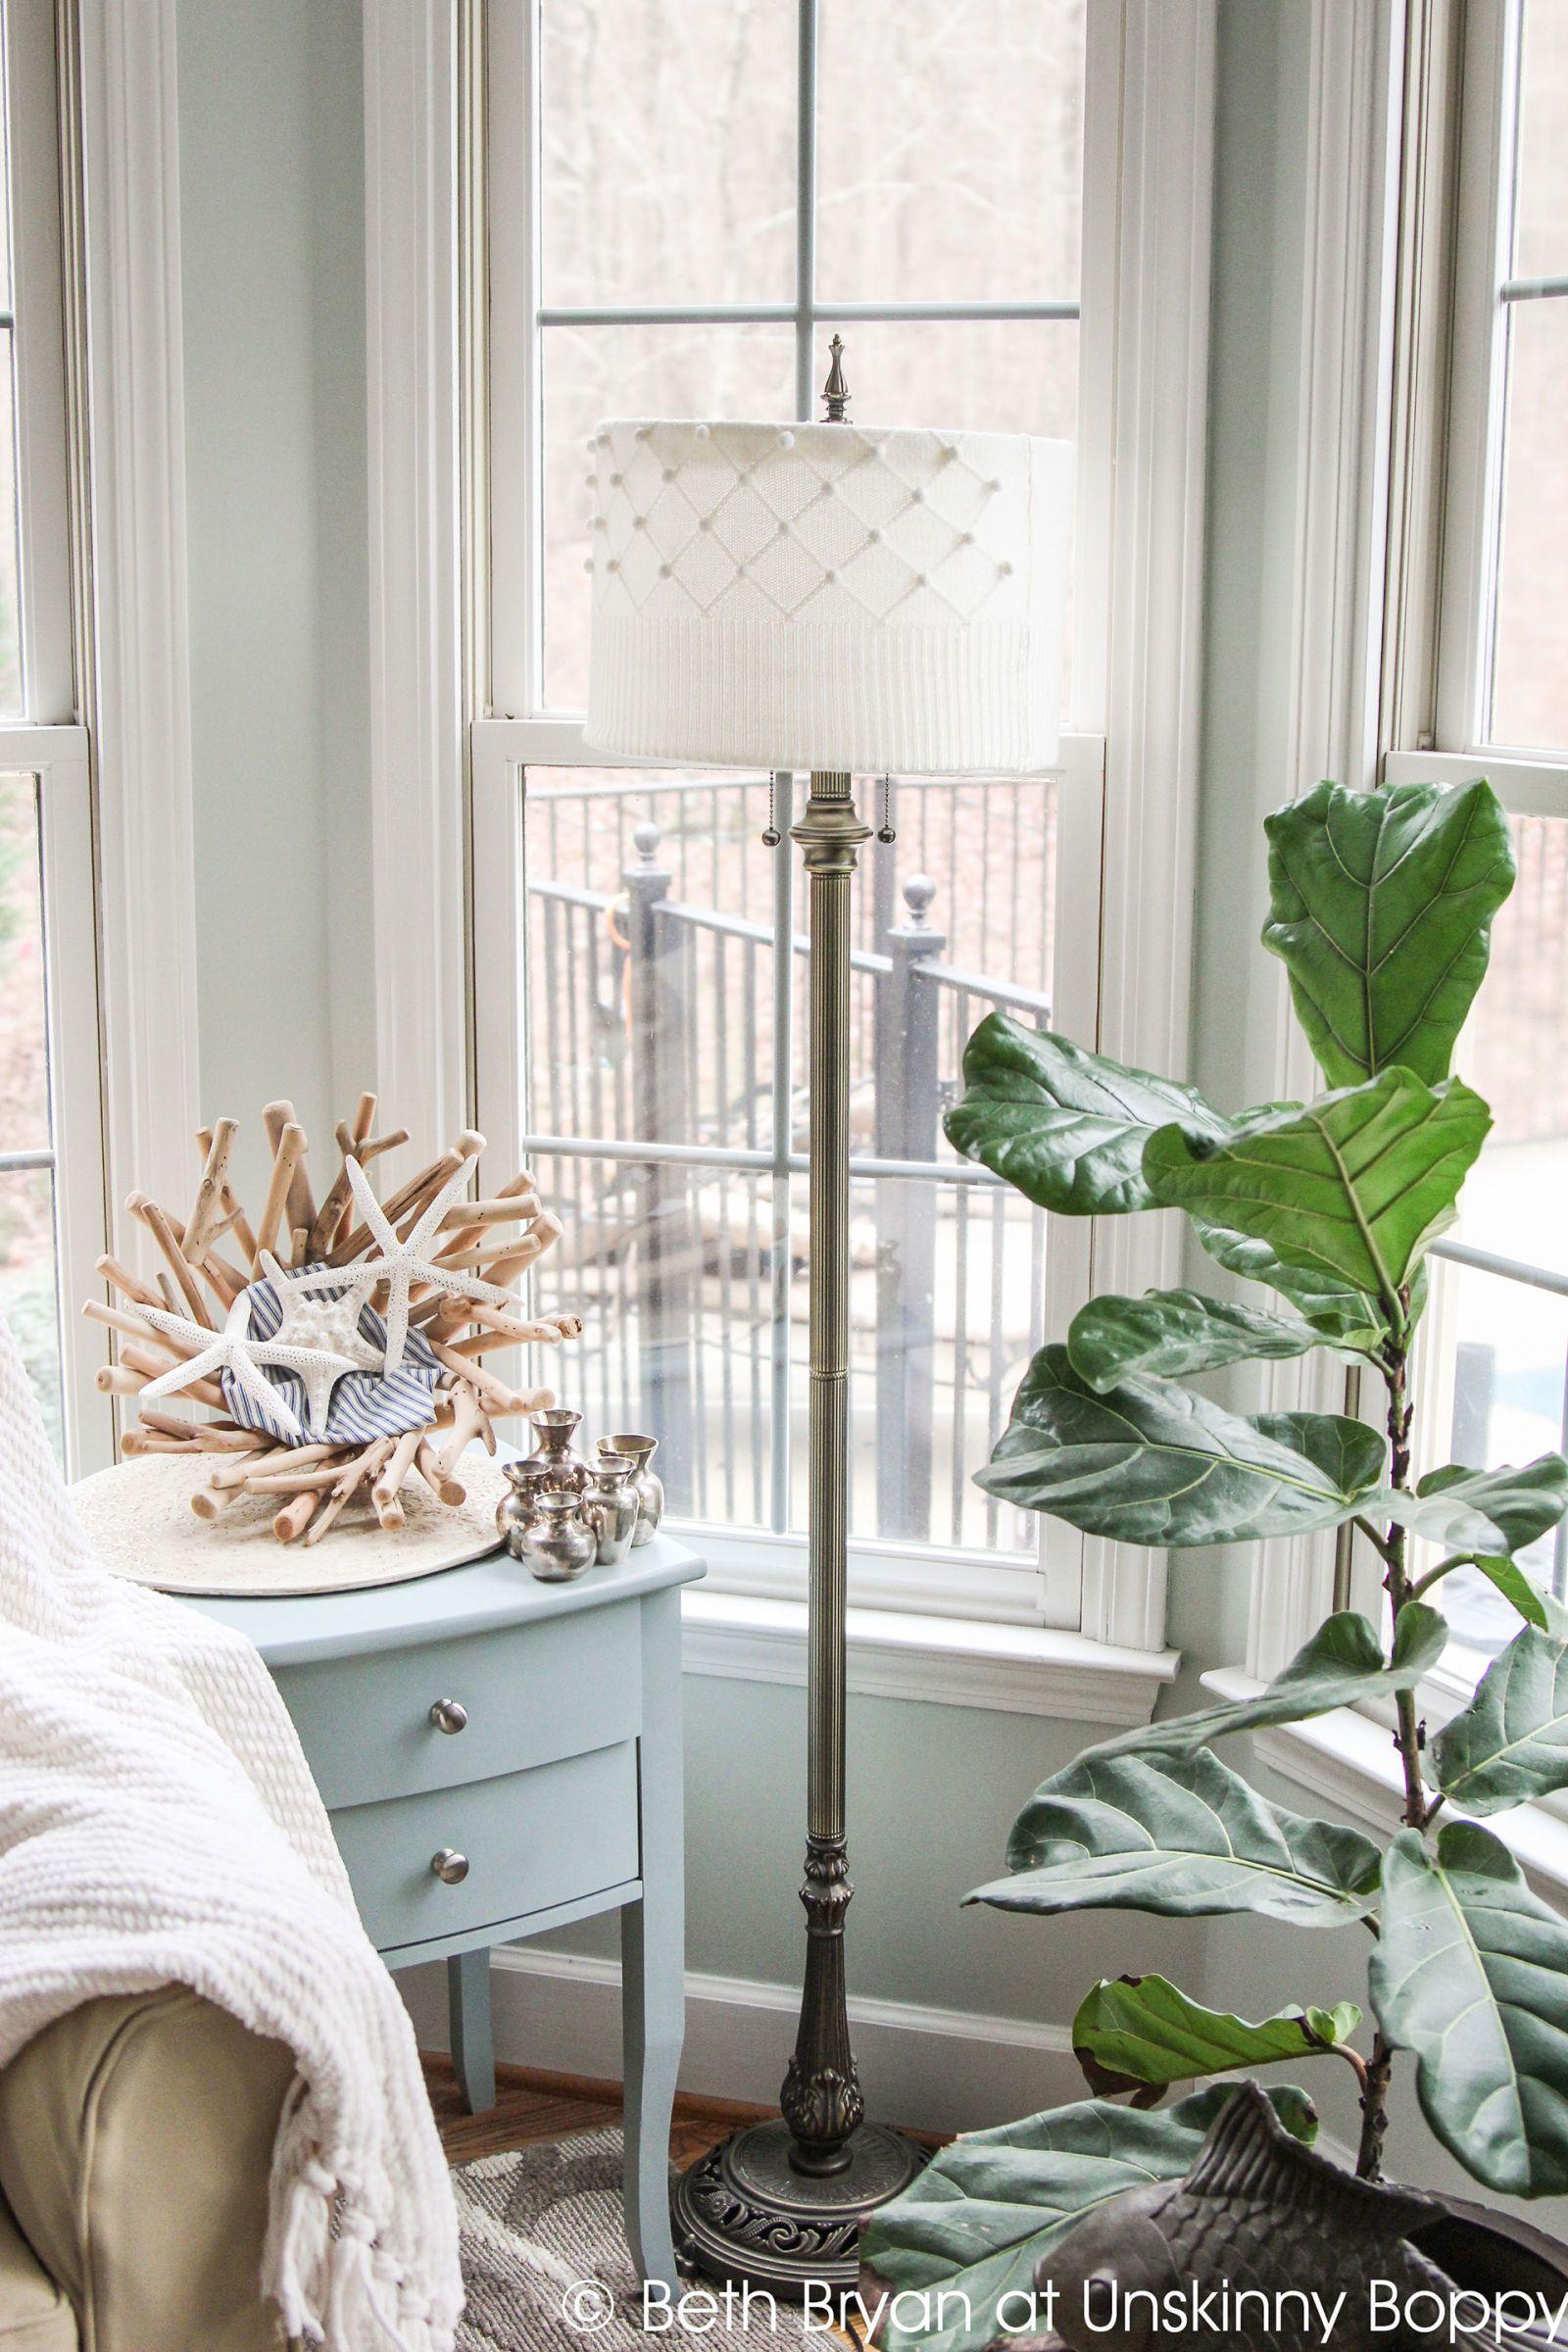 Trash To Treasure Ideas Home Decor Part - 26: Good Housekeeping